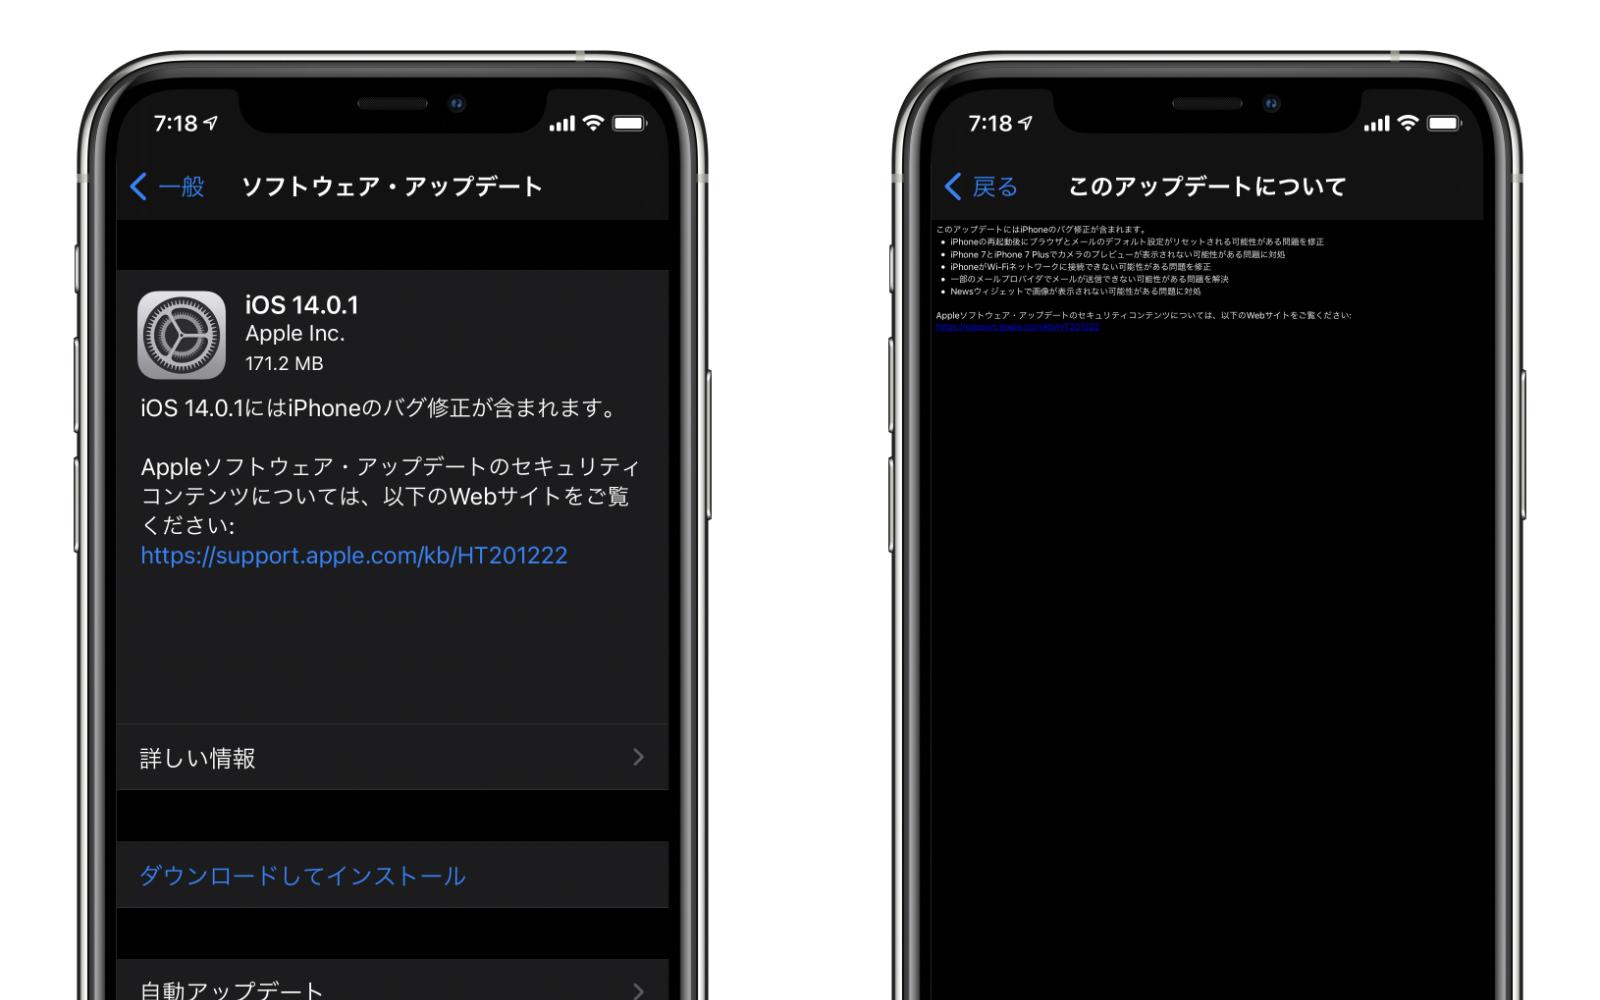 IOS14 0 1 release